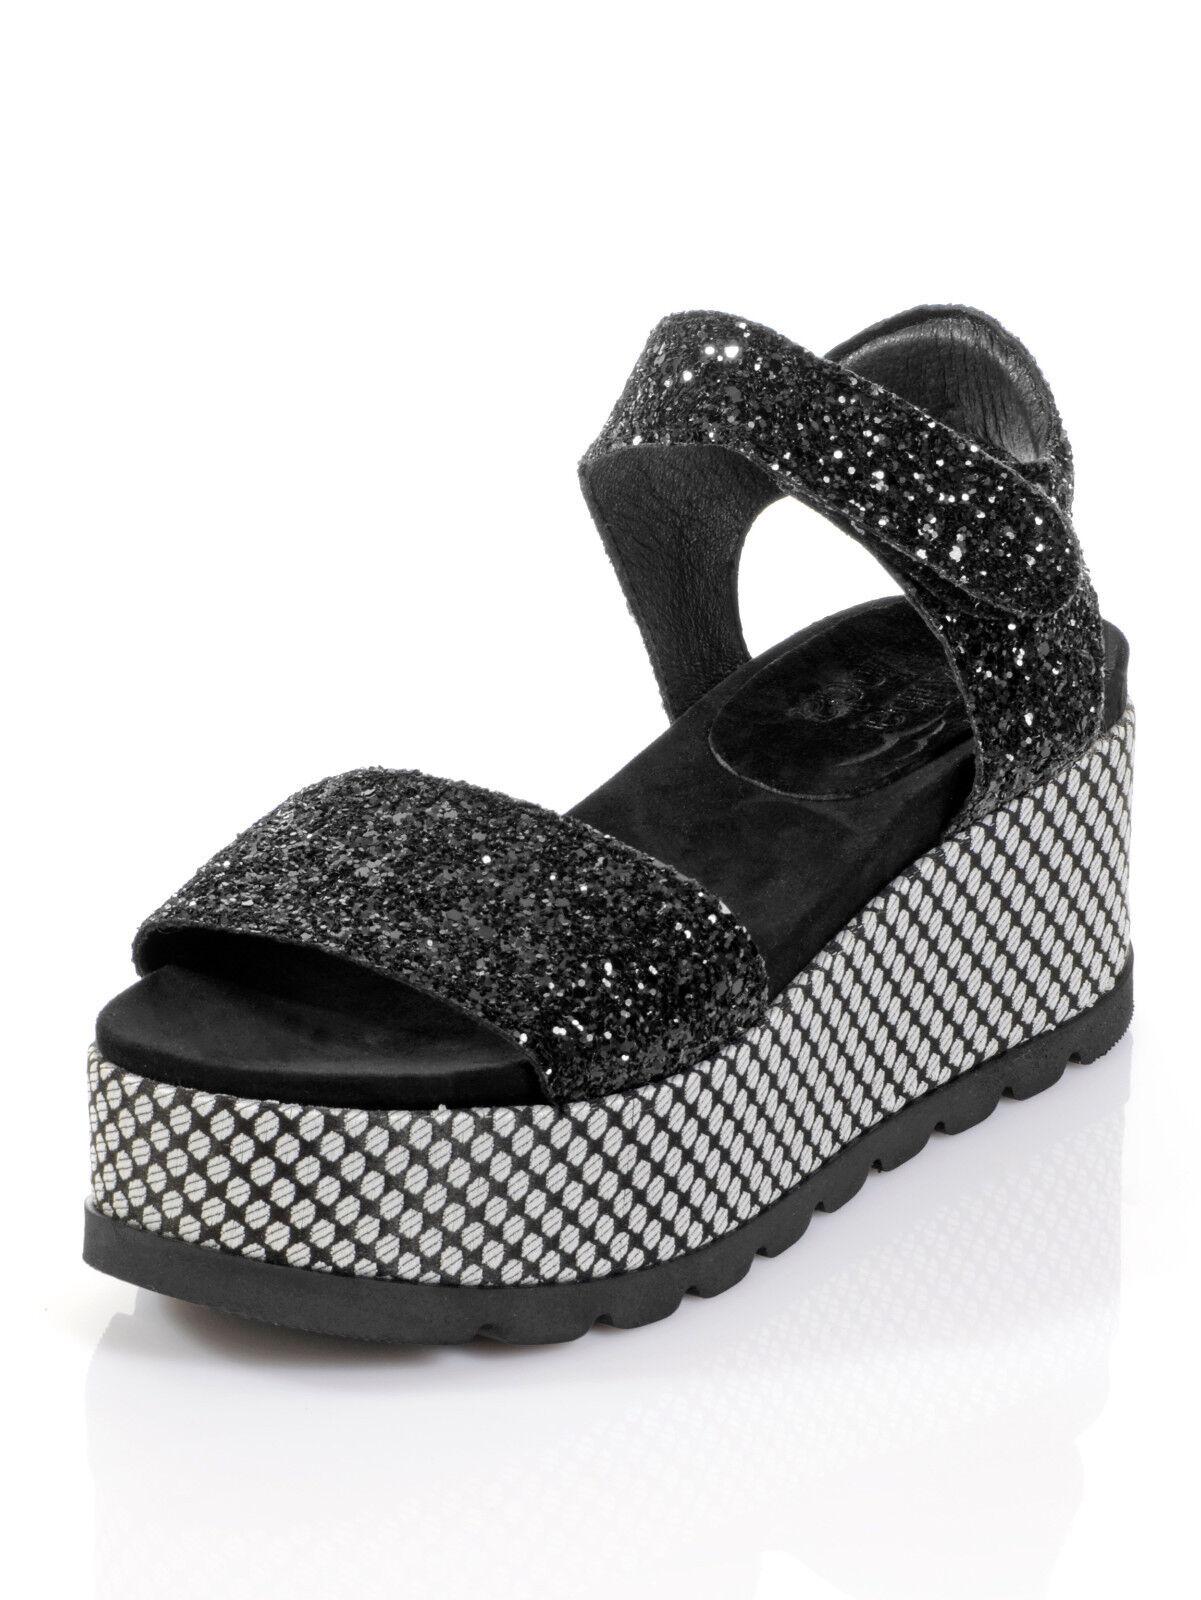 Marken Sandaleetten schwarz in Glitter-Optik  Gr. 37 0518385456